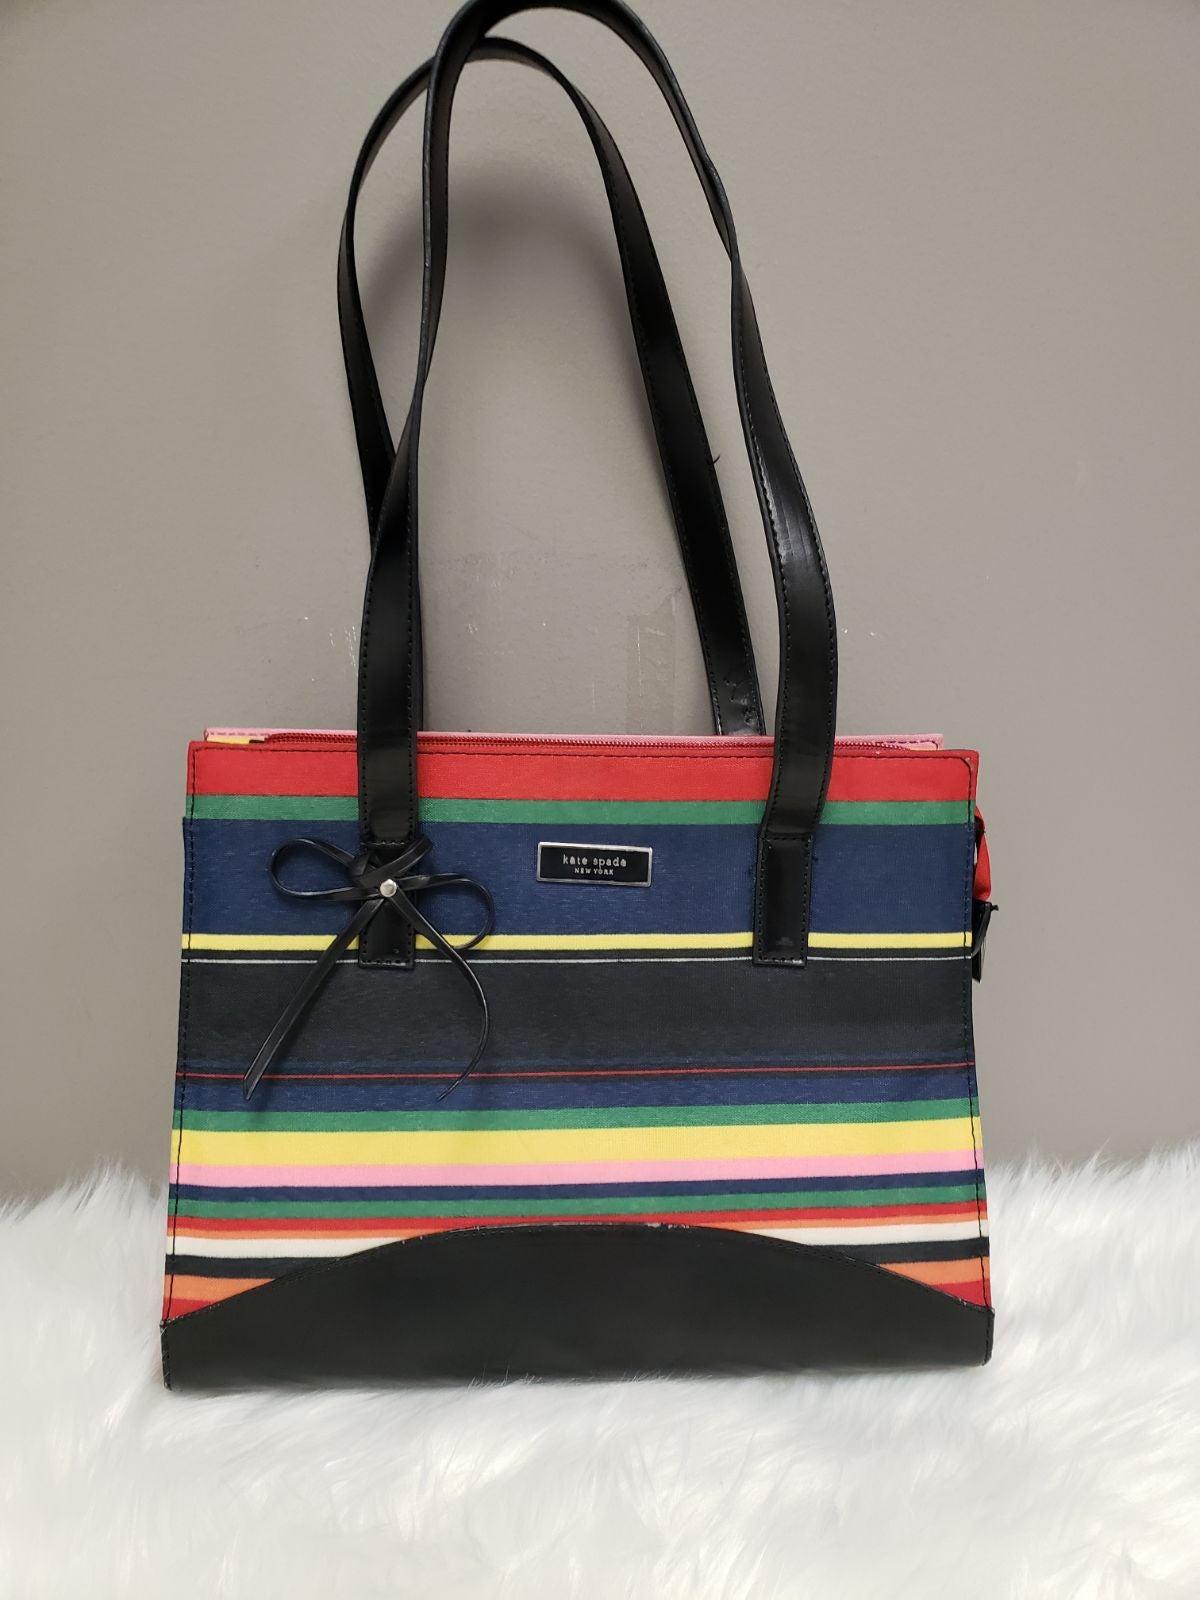 Kate Spade New York striped bag